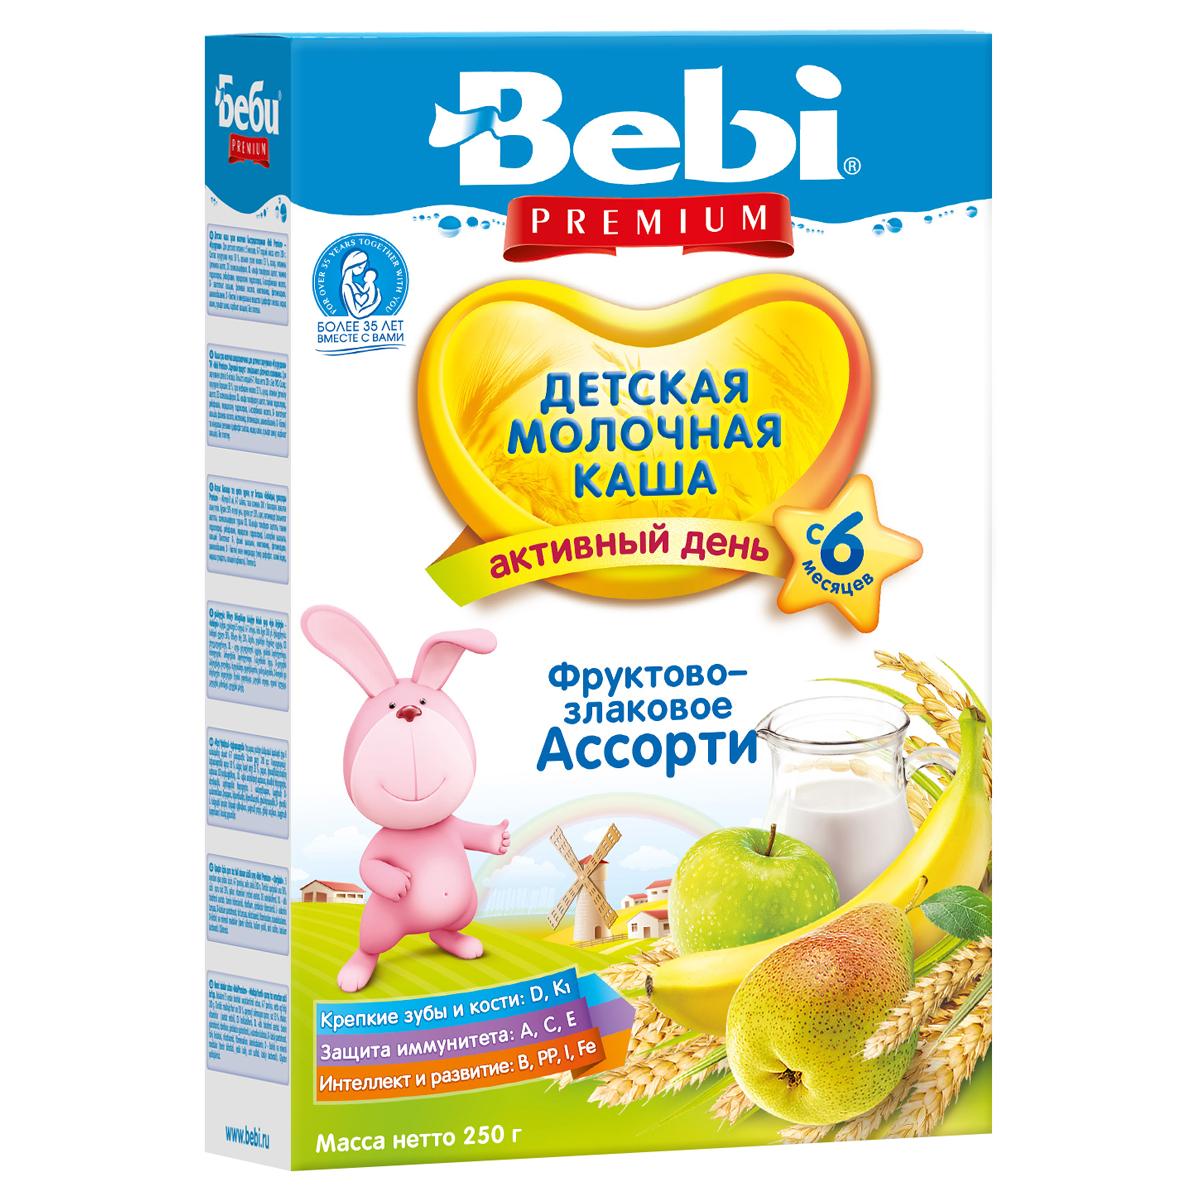 Каша Bebi Premium молочная 200 гр Фруктово-злаковое ассорти (с 6 мес)<br>